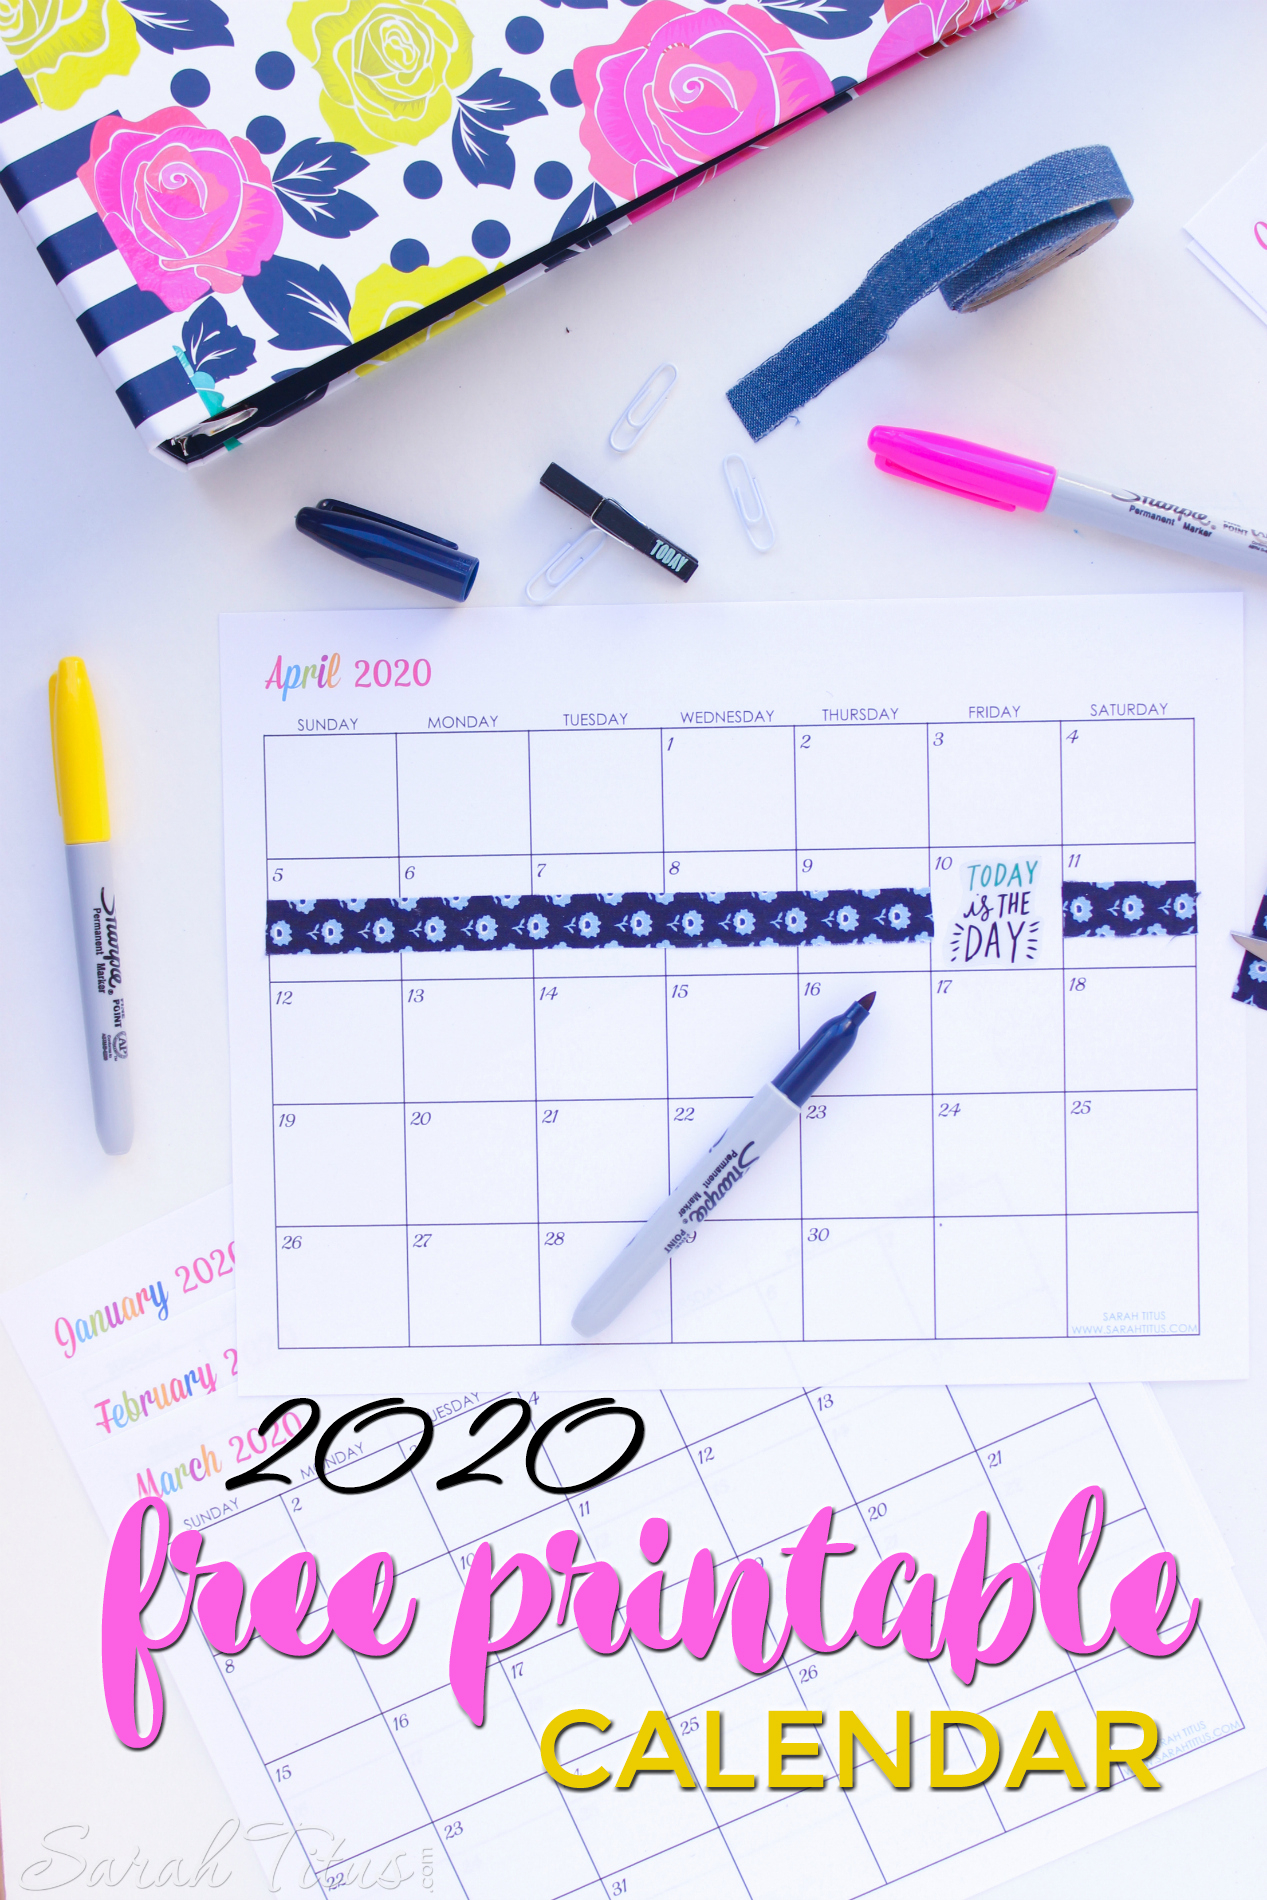 Custom Editable 2020 Free Printable Calendars - Sarah Titus for 2020 Calender I Can Edit